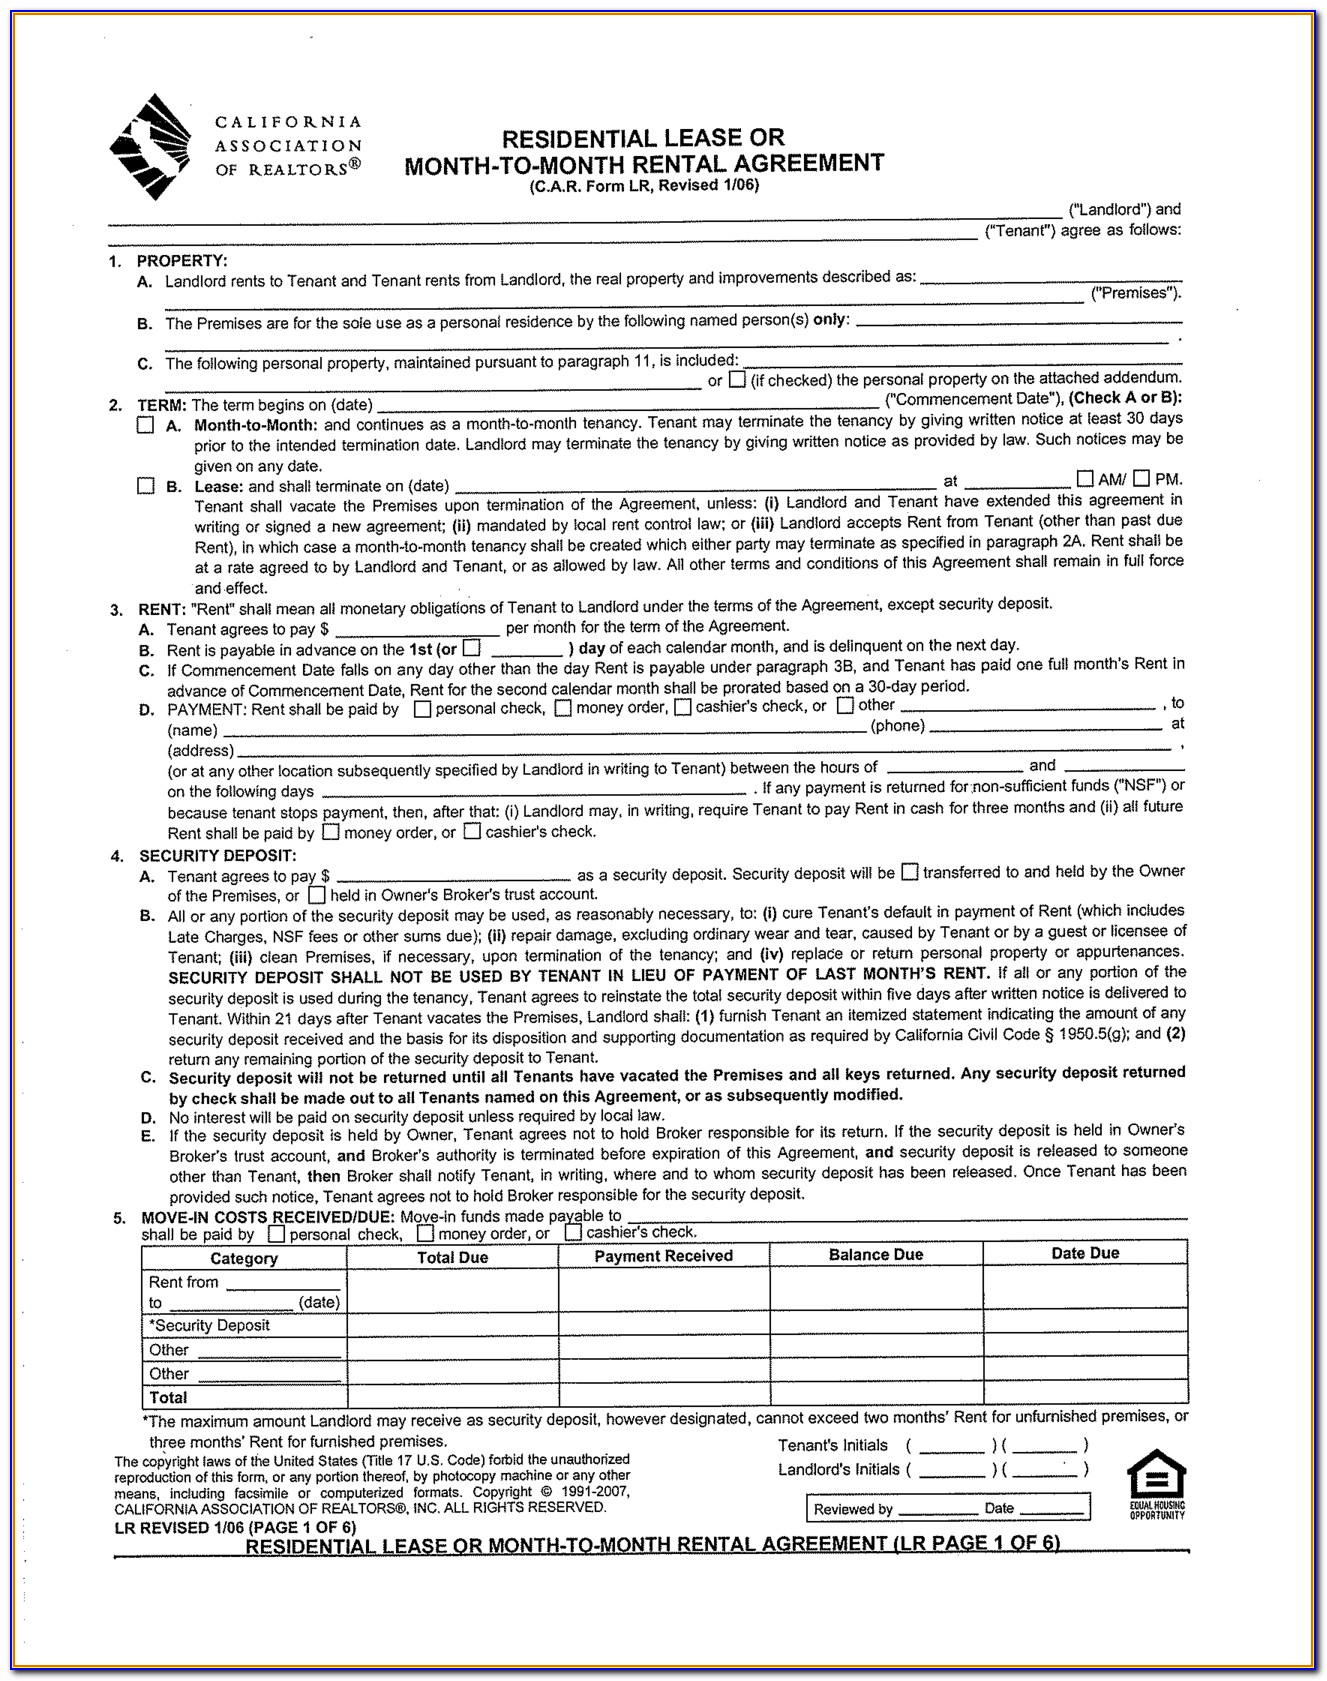 Rental Agreement Form California Association Of Realtors